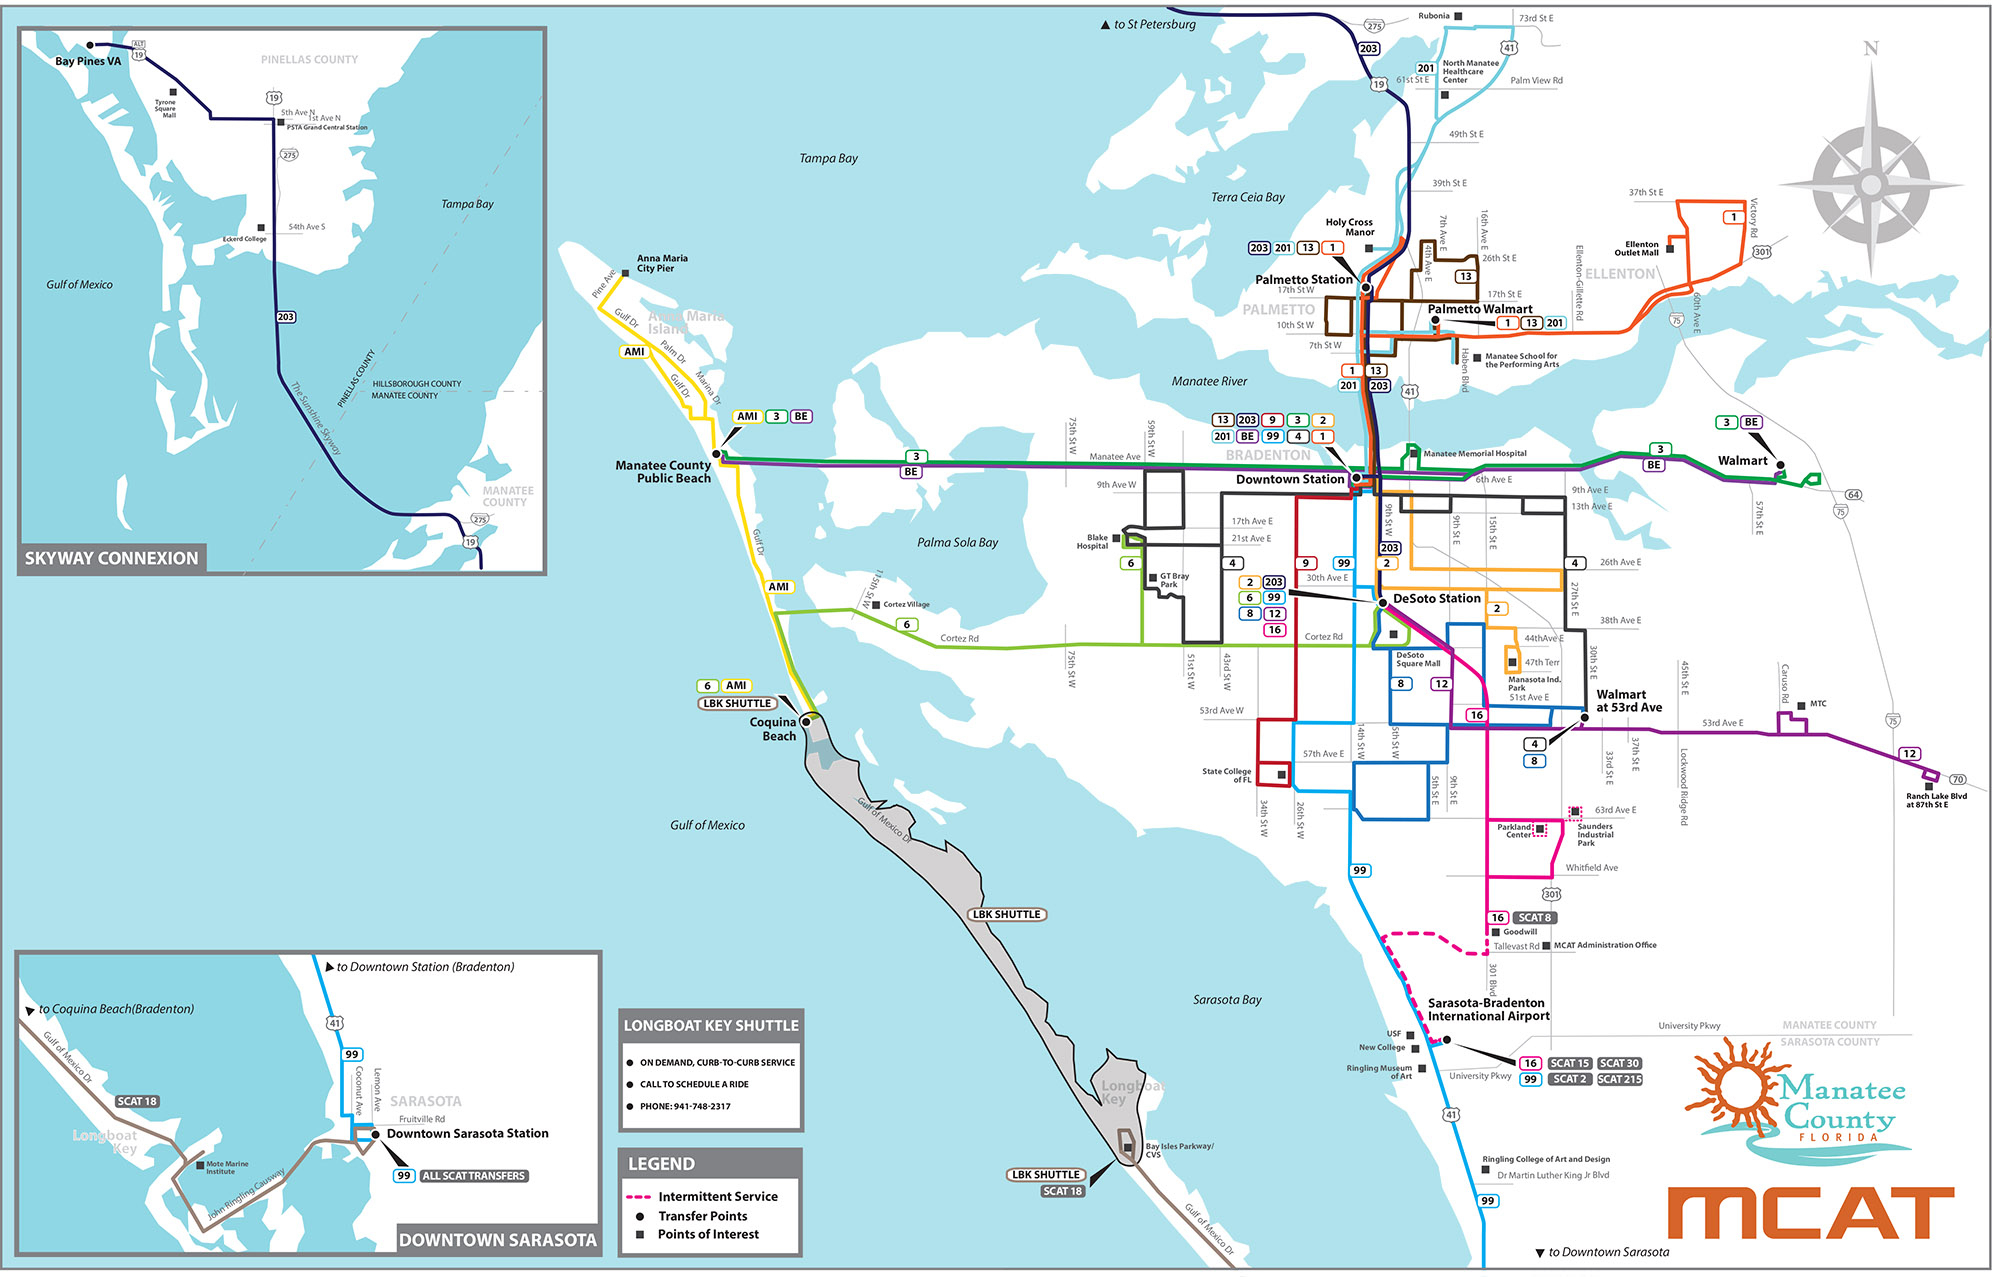 System Map | Mcat - Palmetto Florida Map